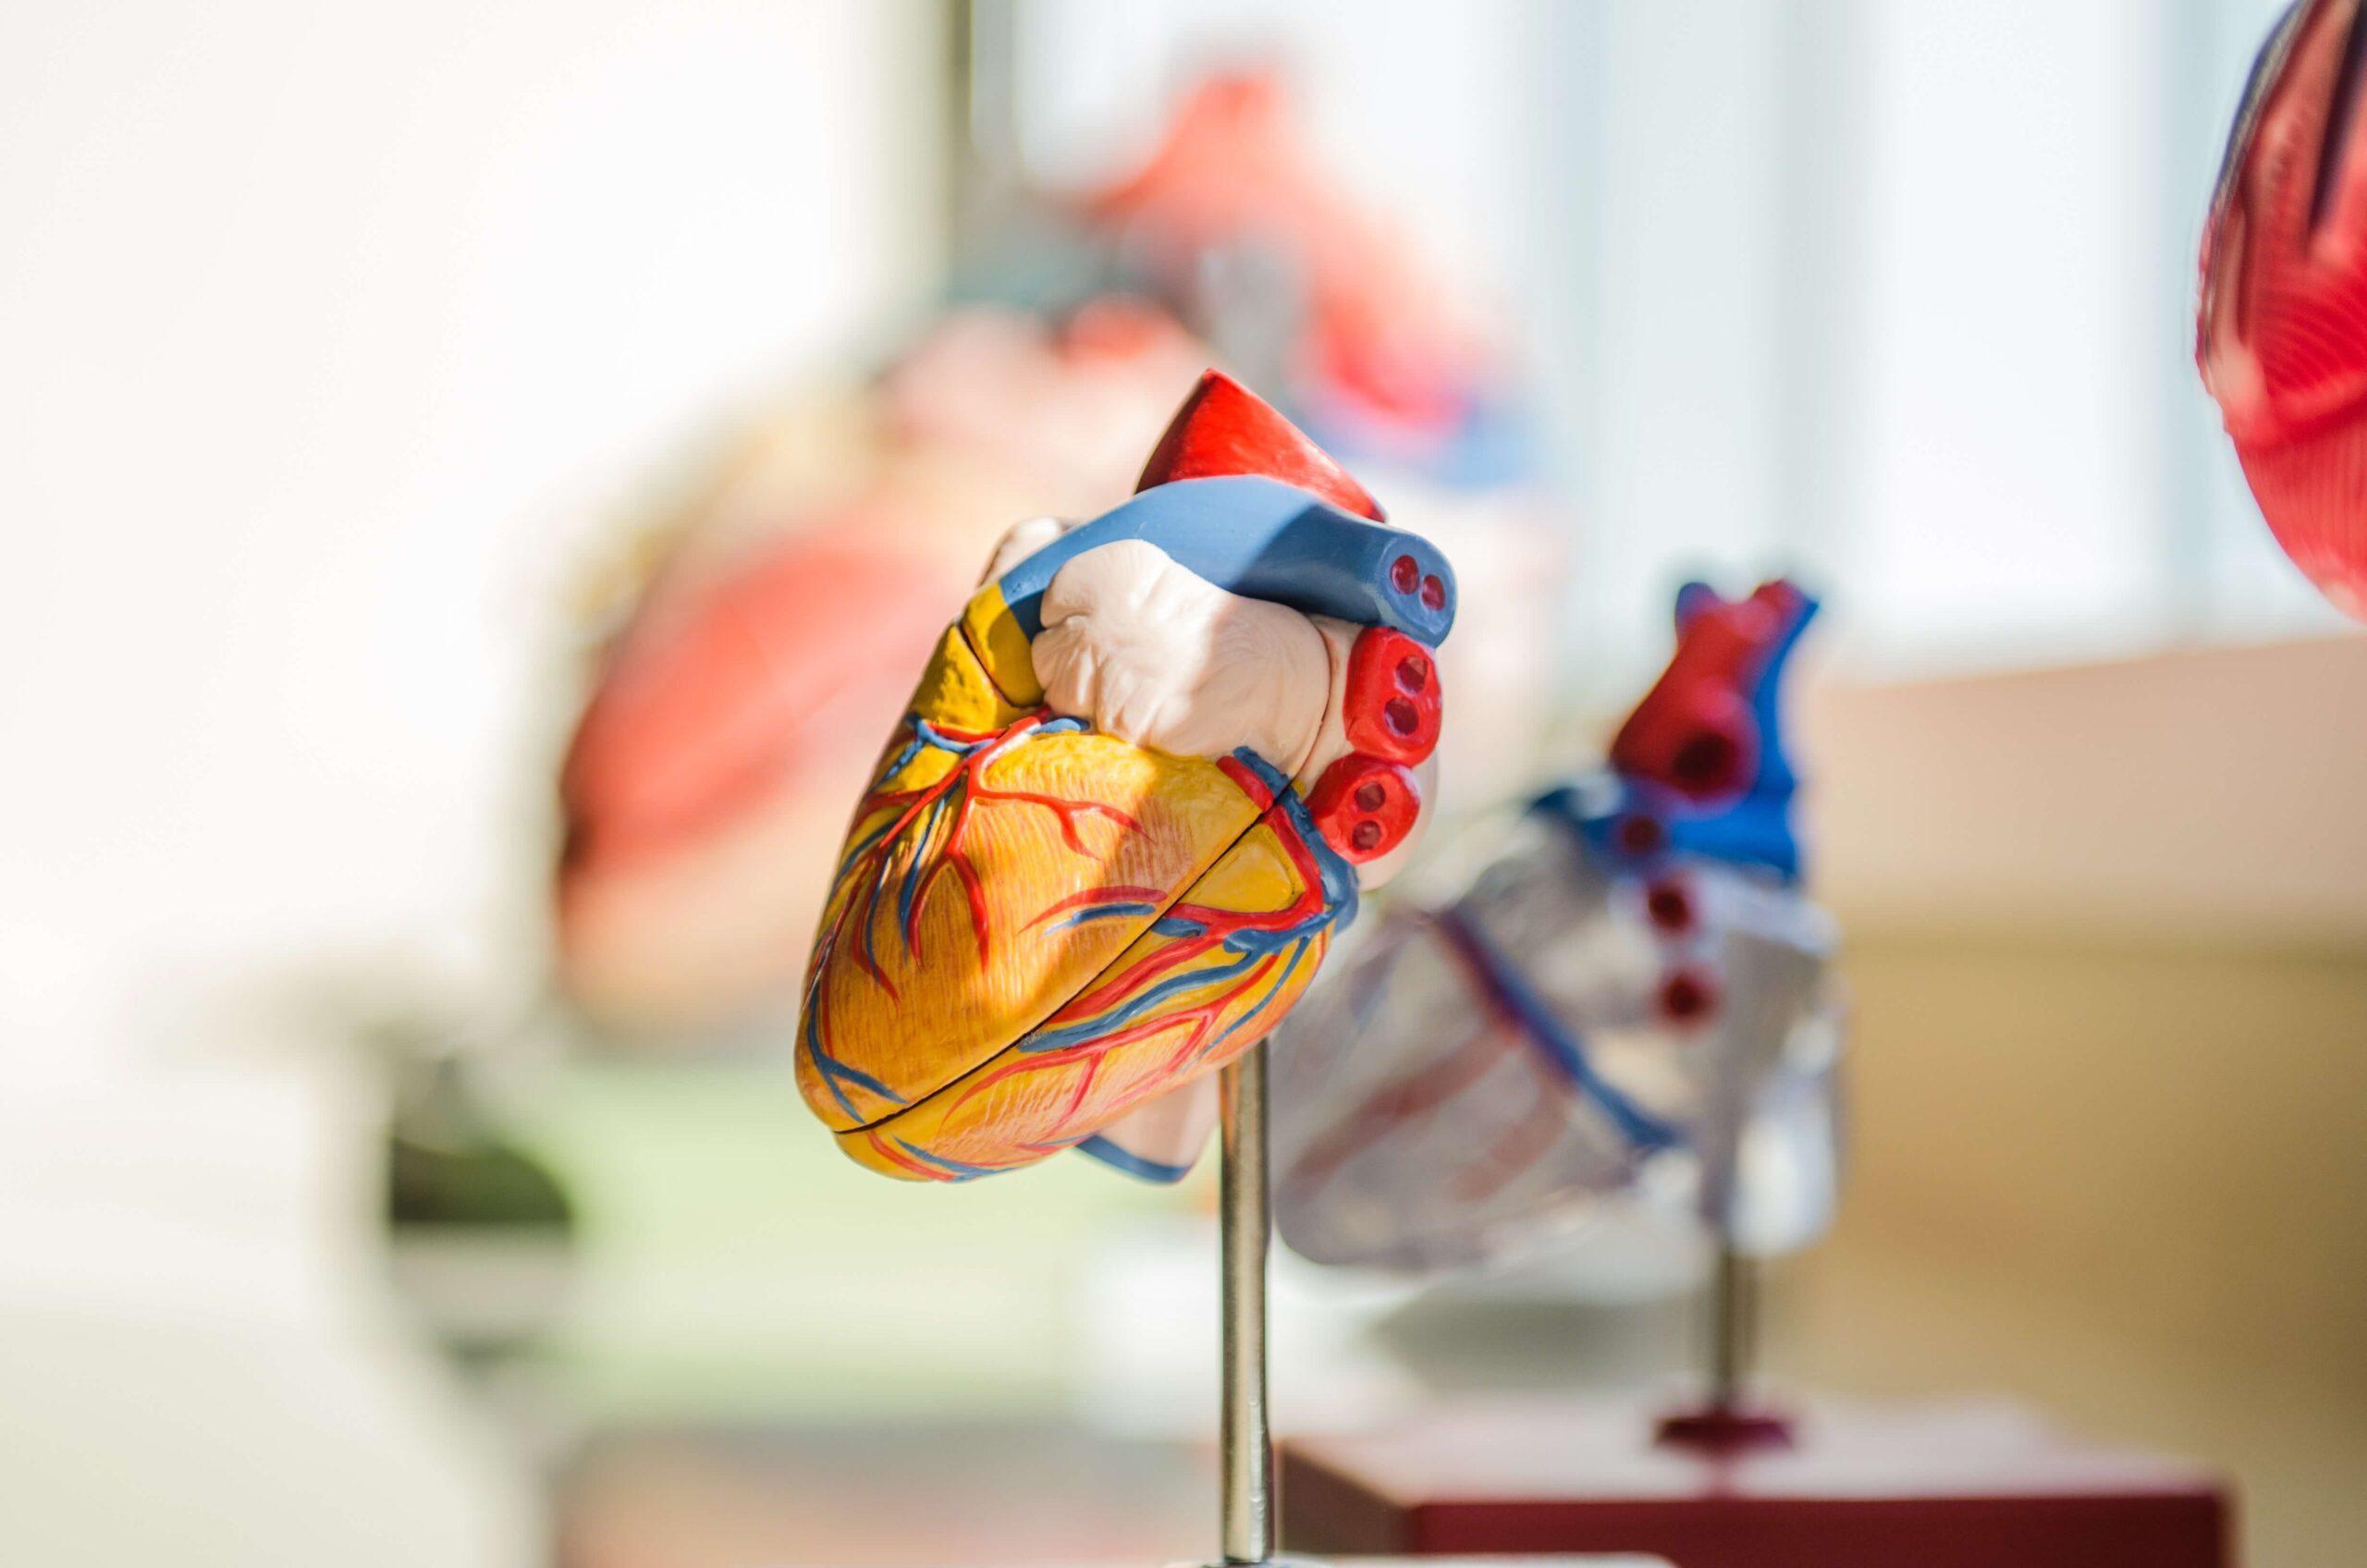 medical 3d printing applications